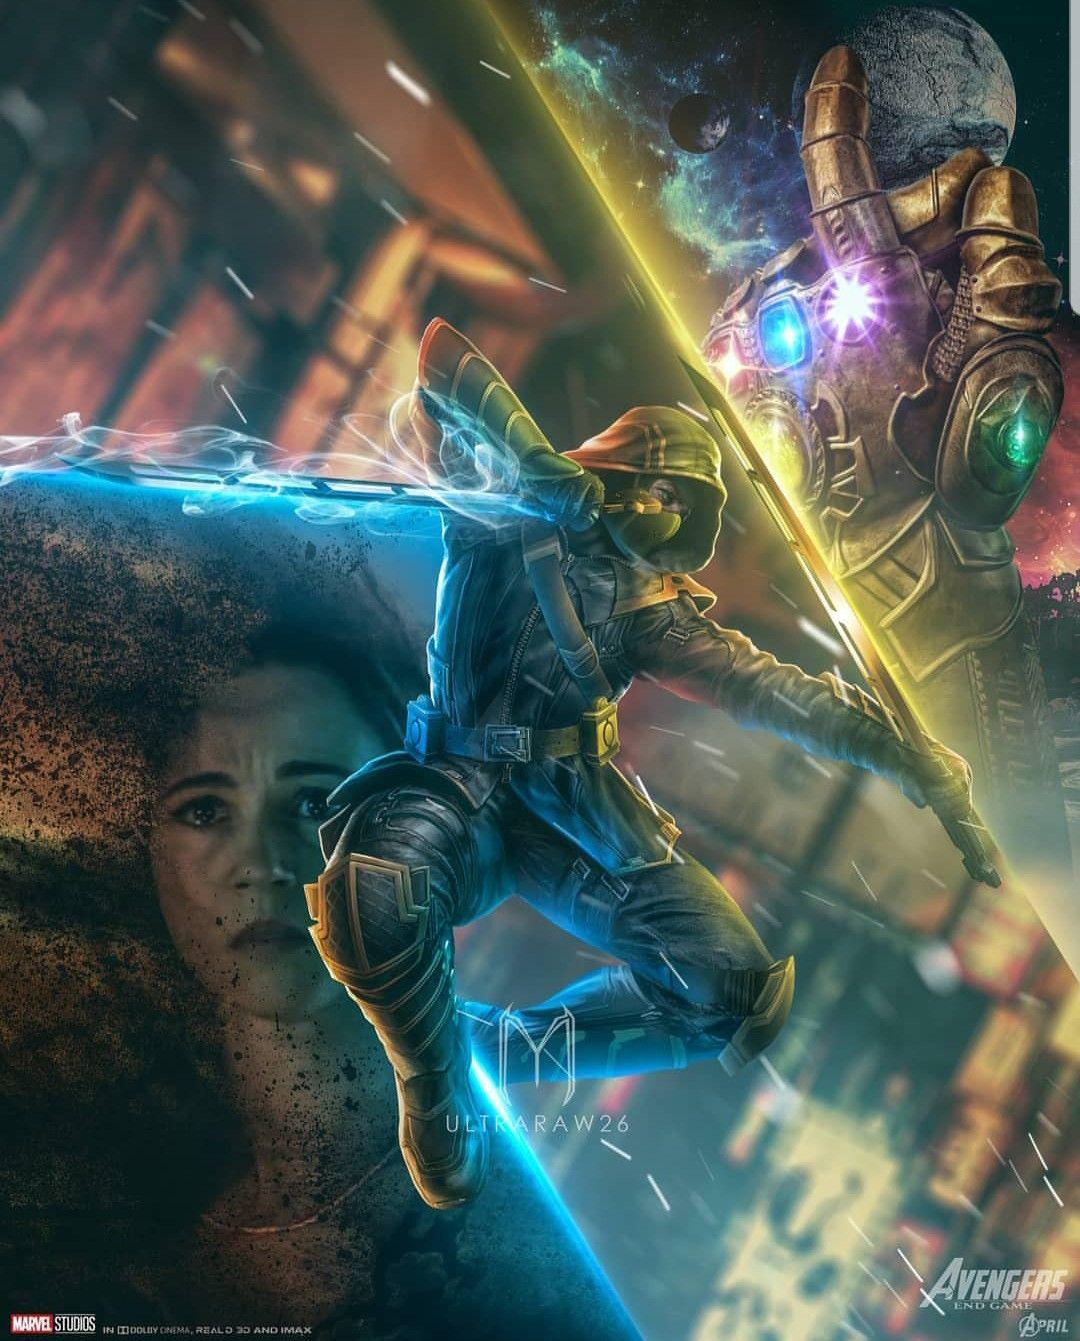 Avengers Endgame art \u2022 Ultraraw26